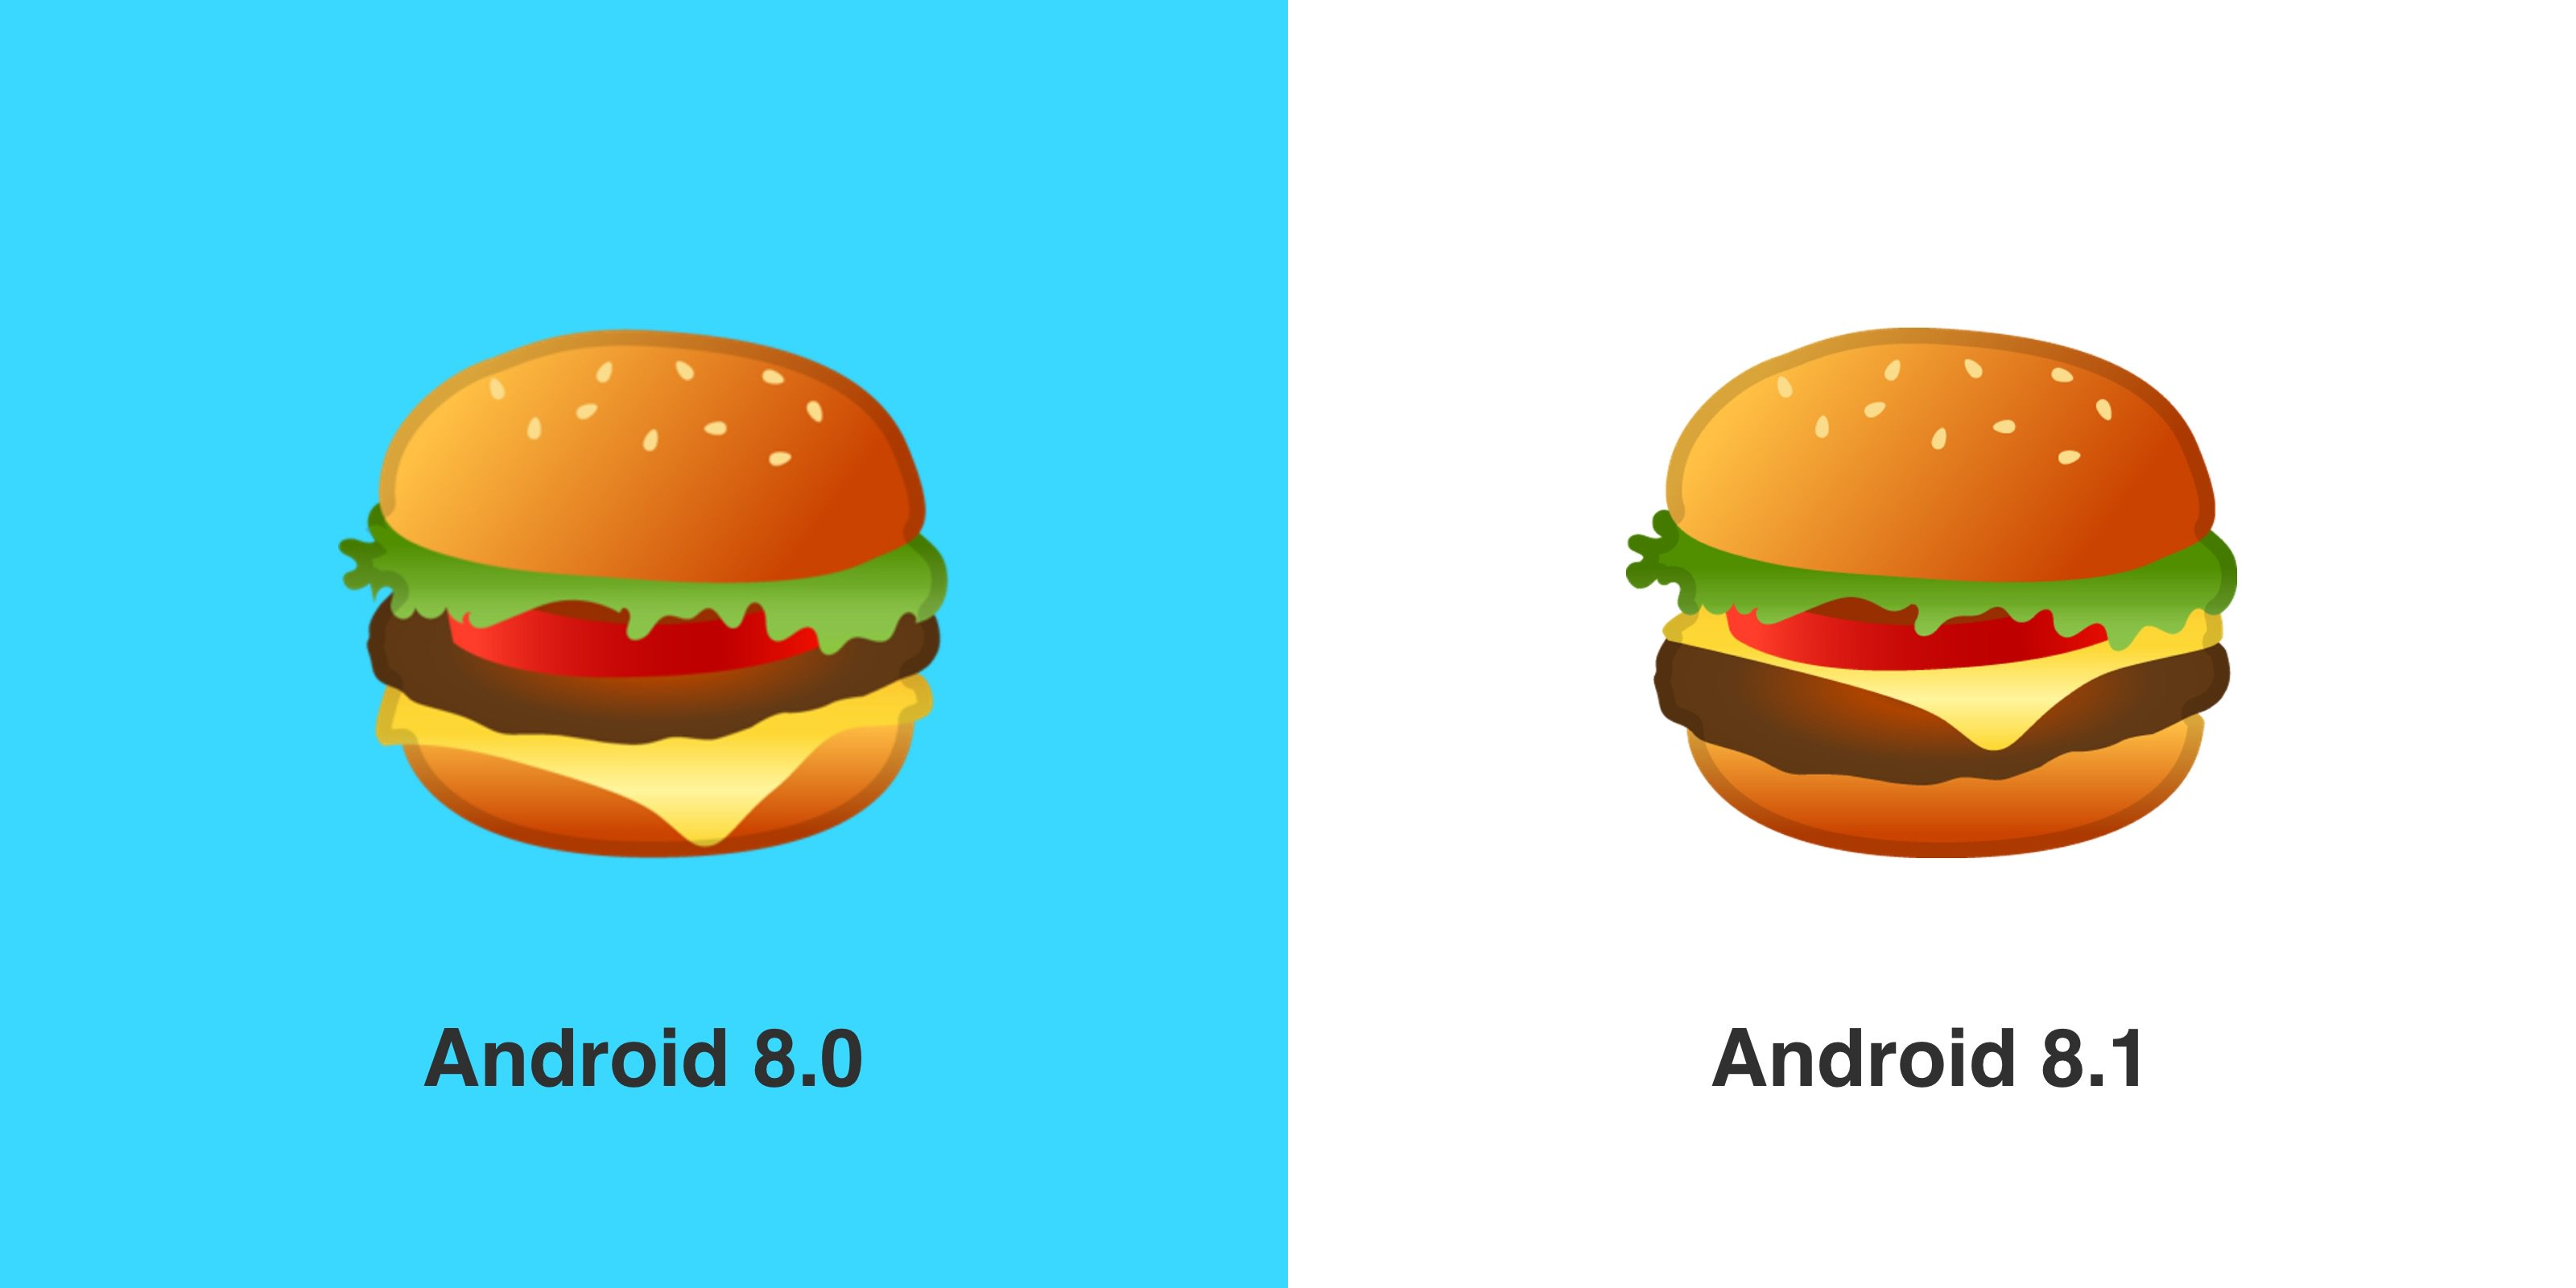 Google/Emojipedia